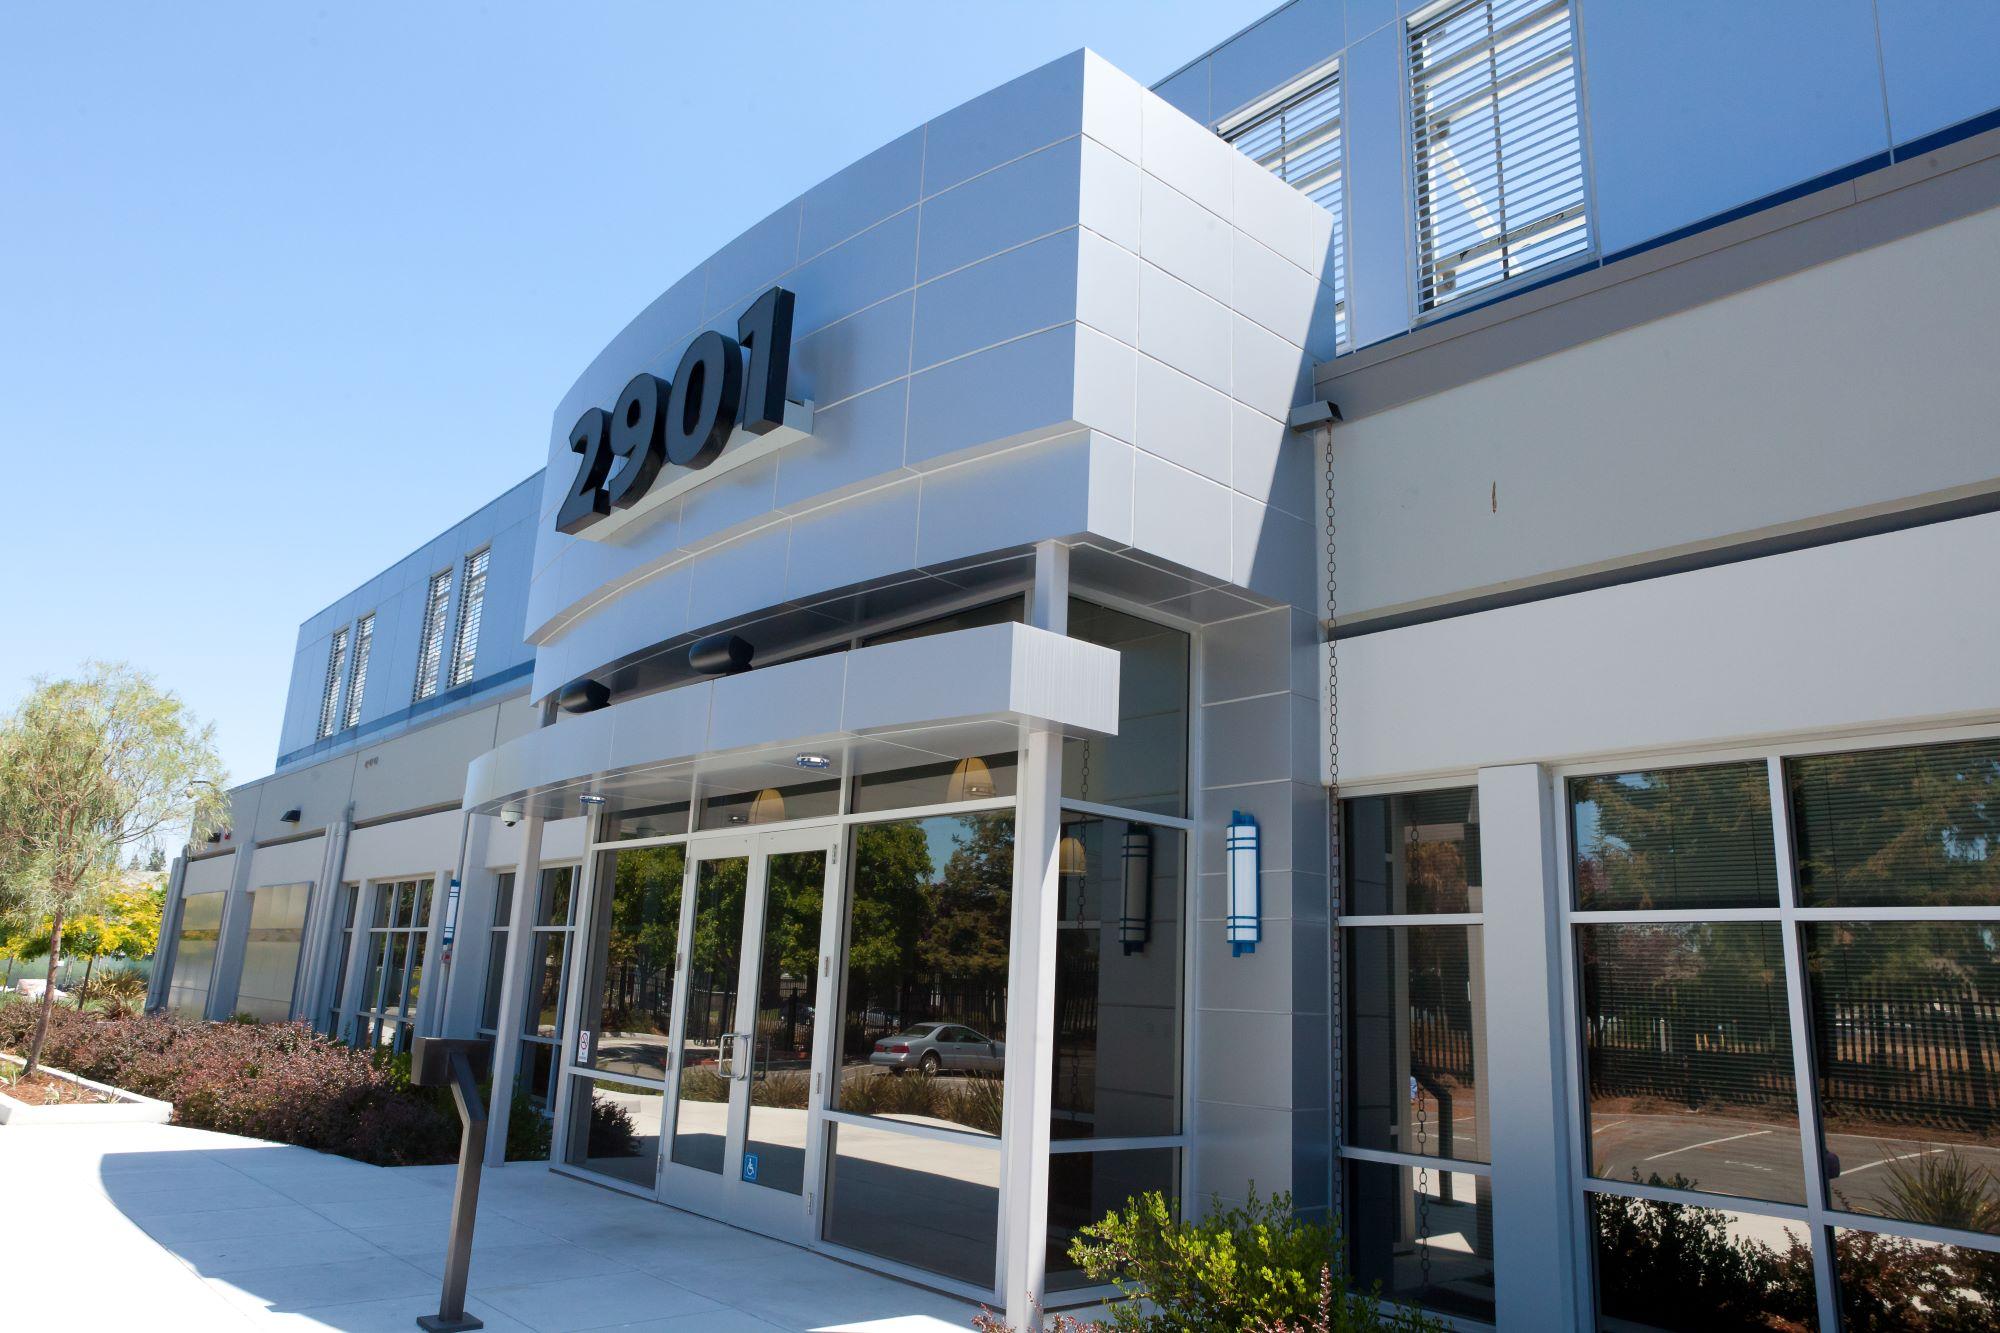 Santa Clara Colocation Data Center (SV3)